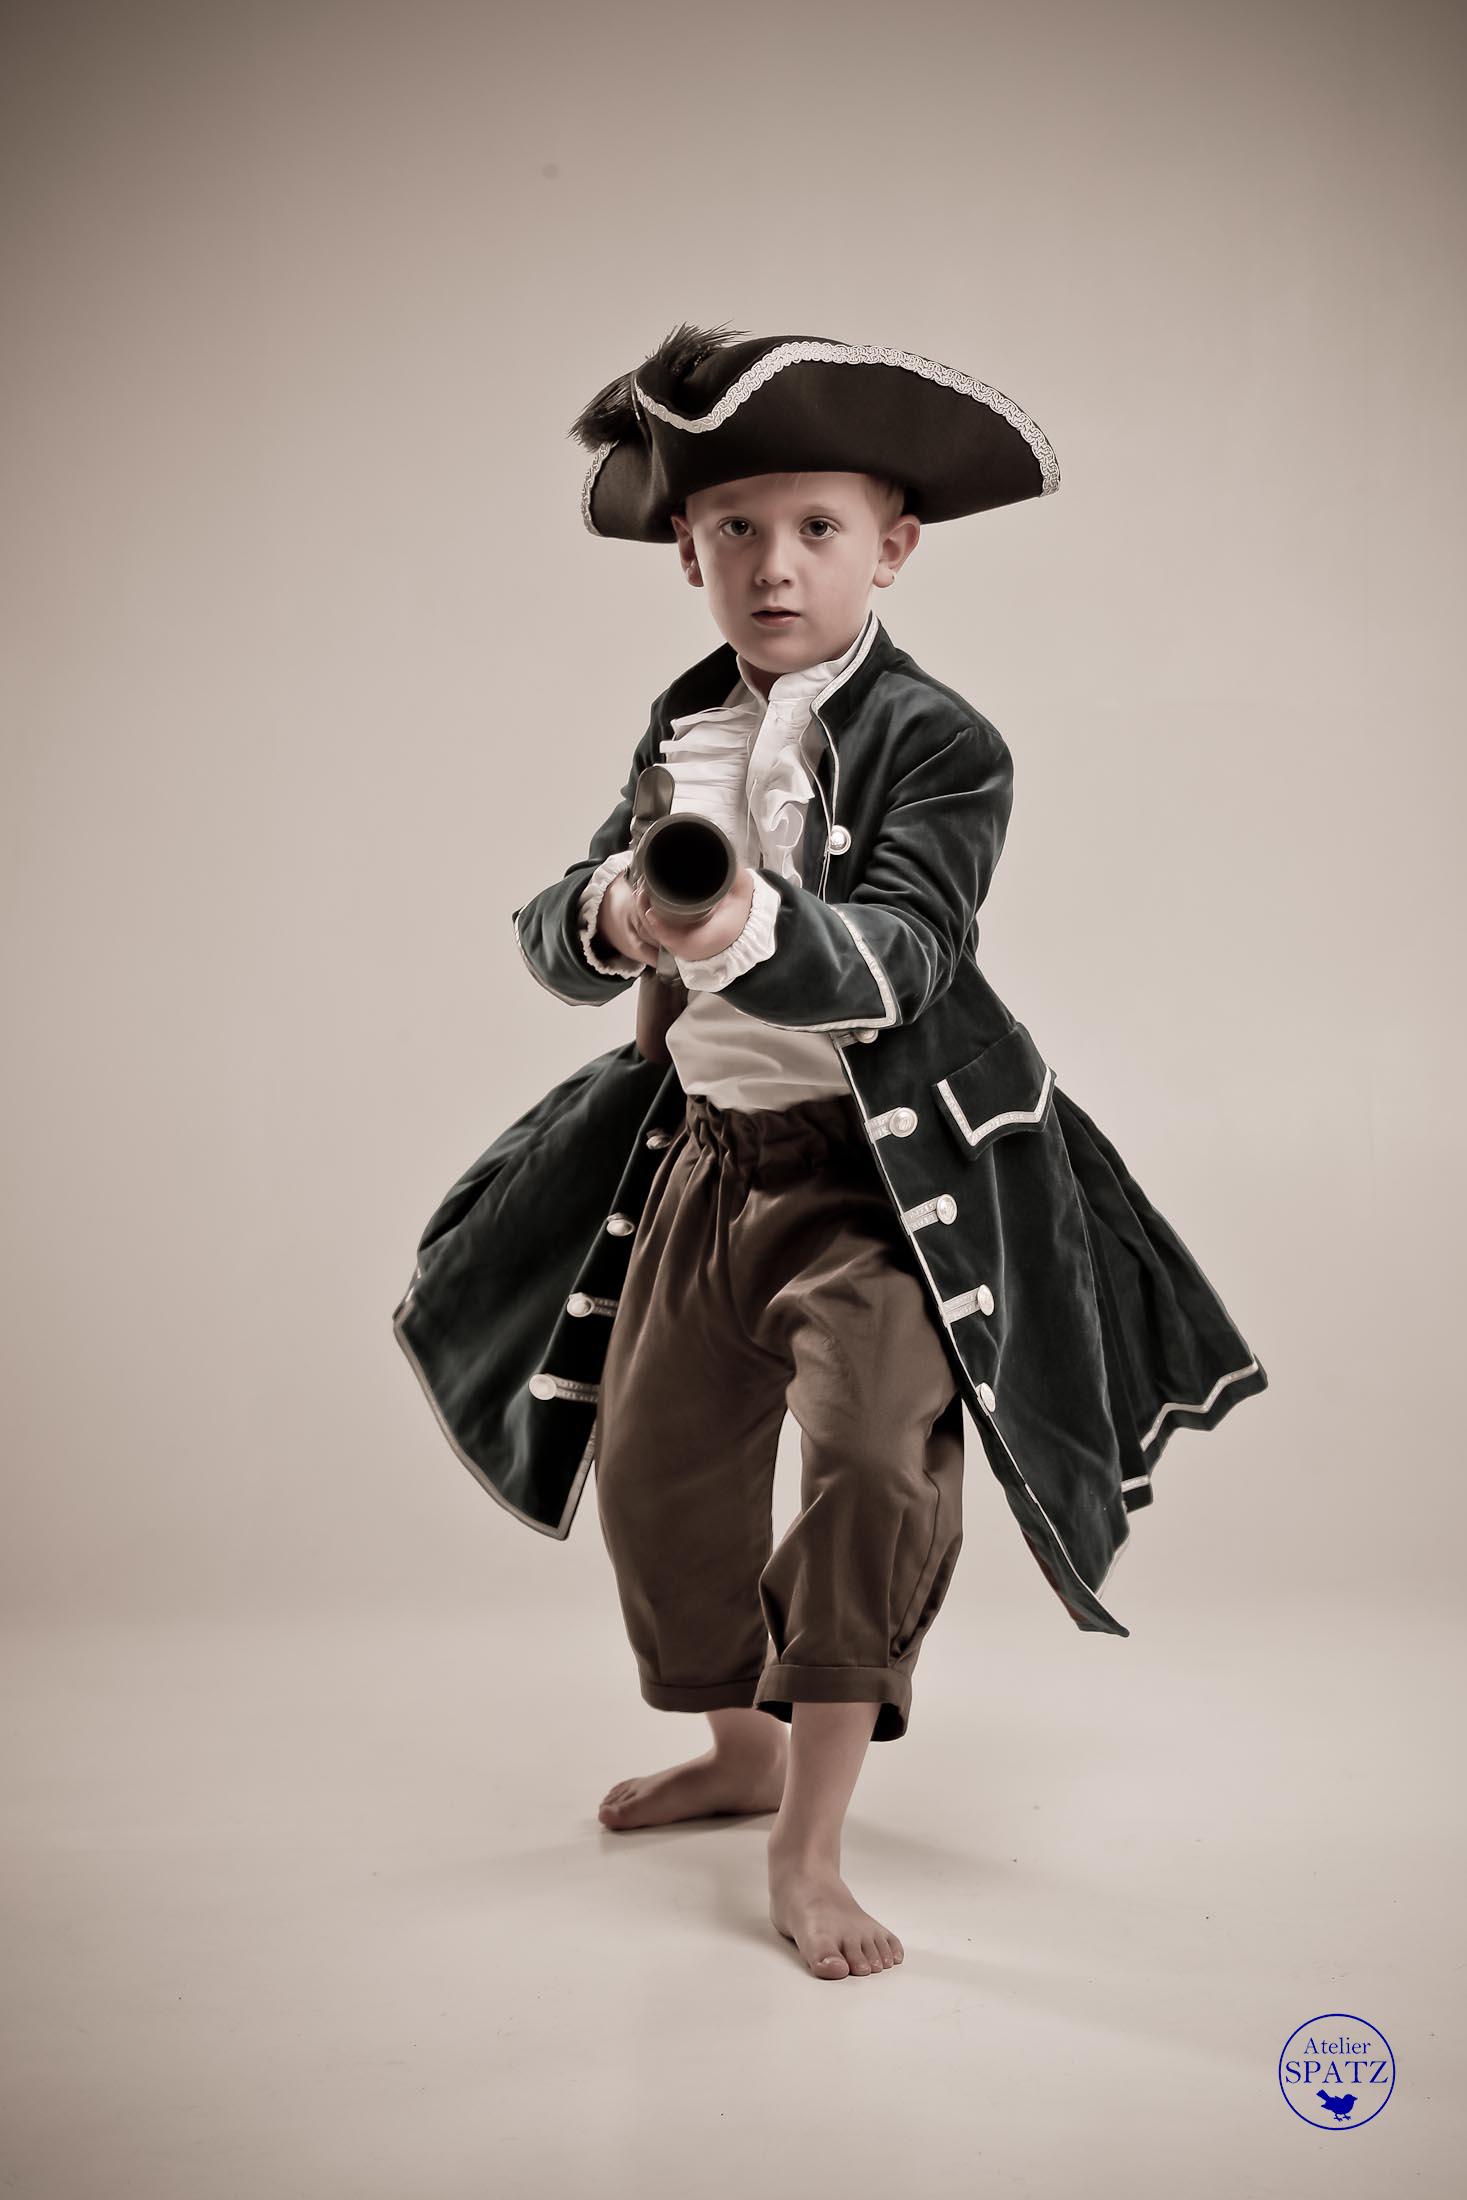 Atelier Spatz Pirate Coat-4.jpg